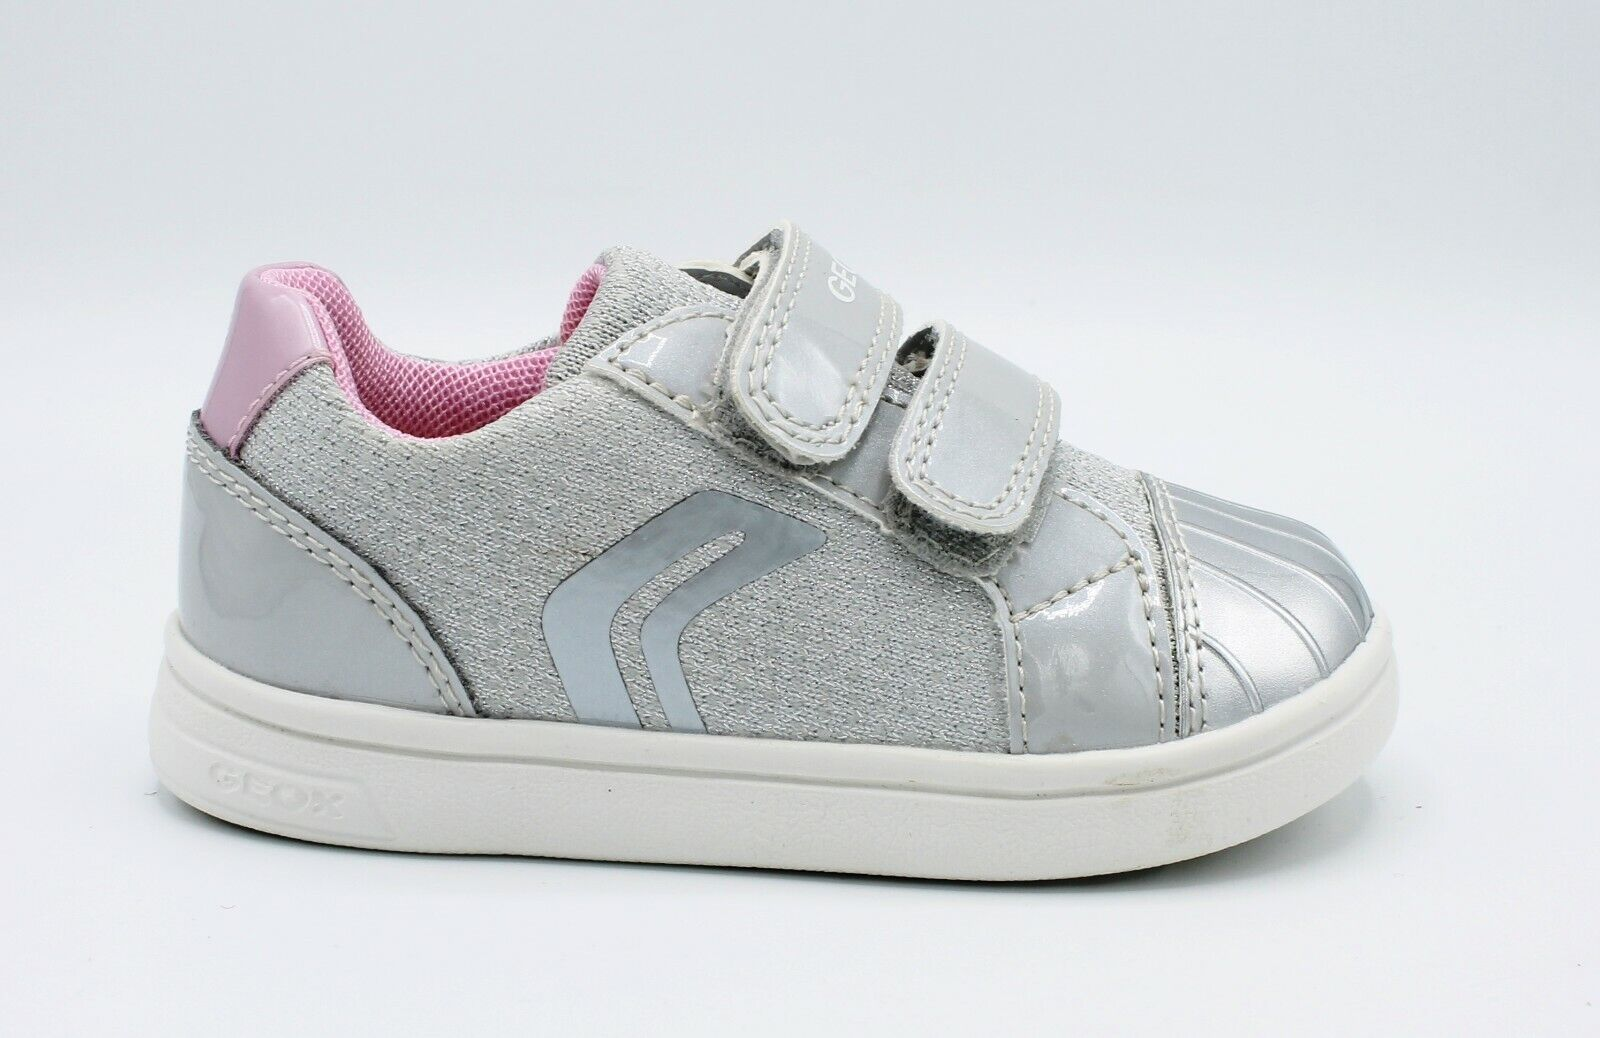 separation shoes 1f336 35023 Turnschuhe 26 Mädchen Geox Test Vergleich +++ Turnschuhe 26 ...